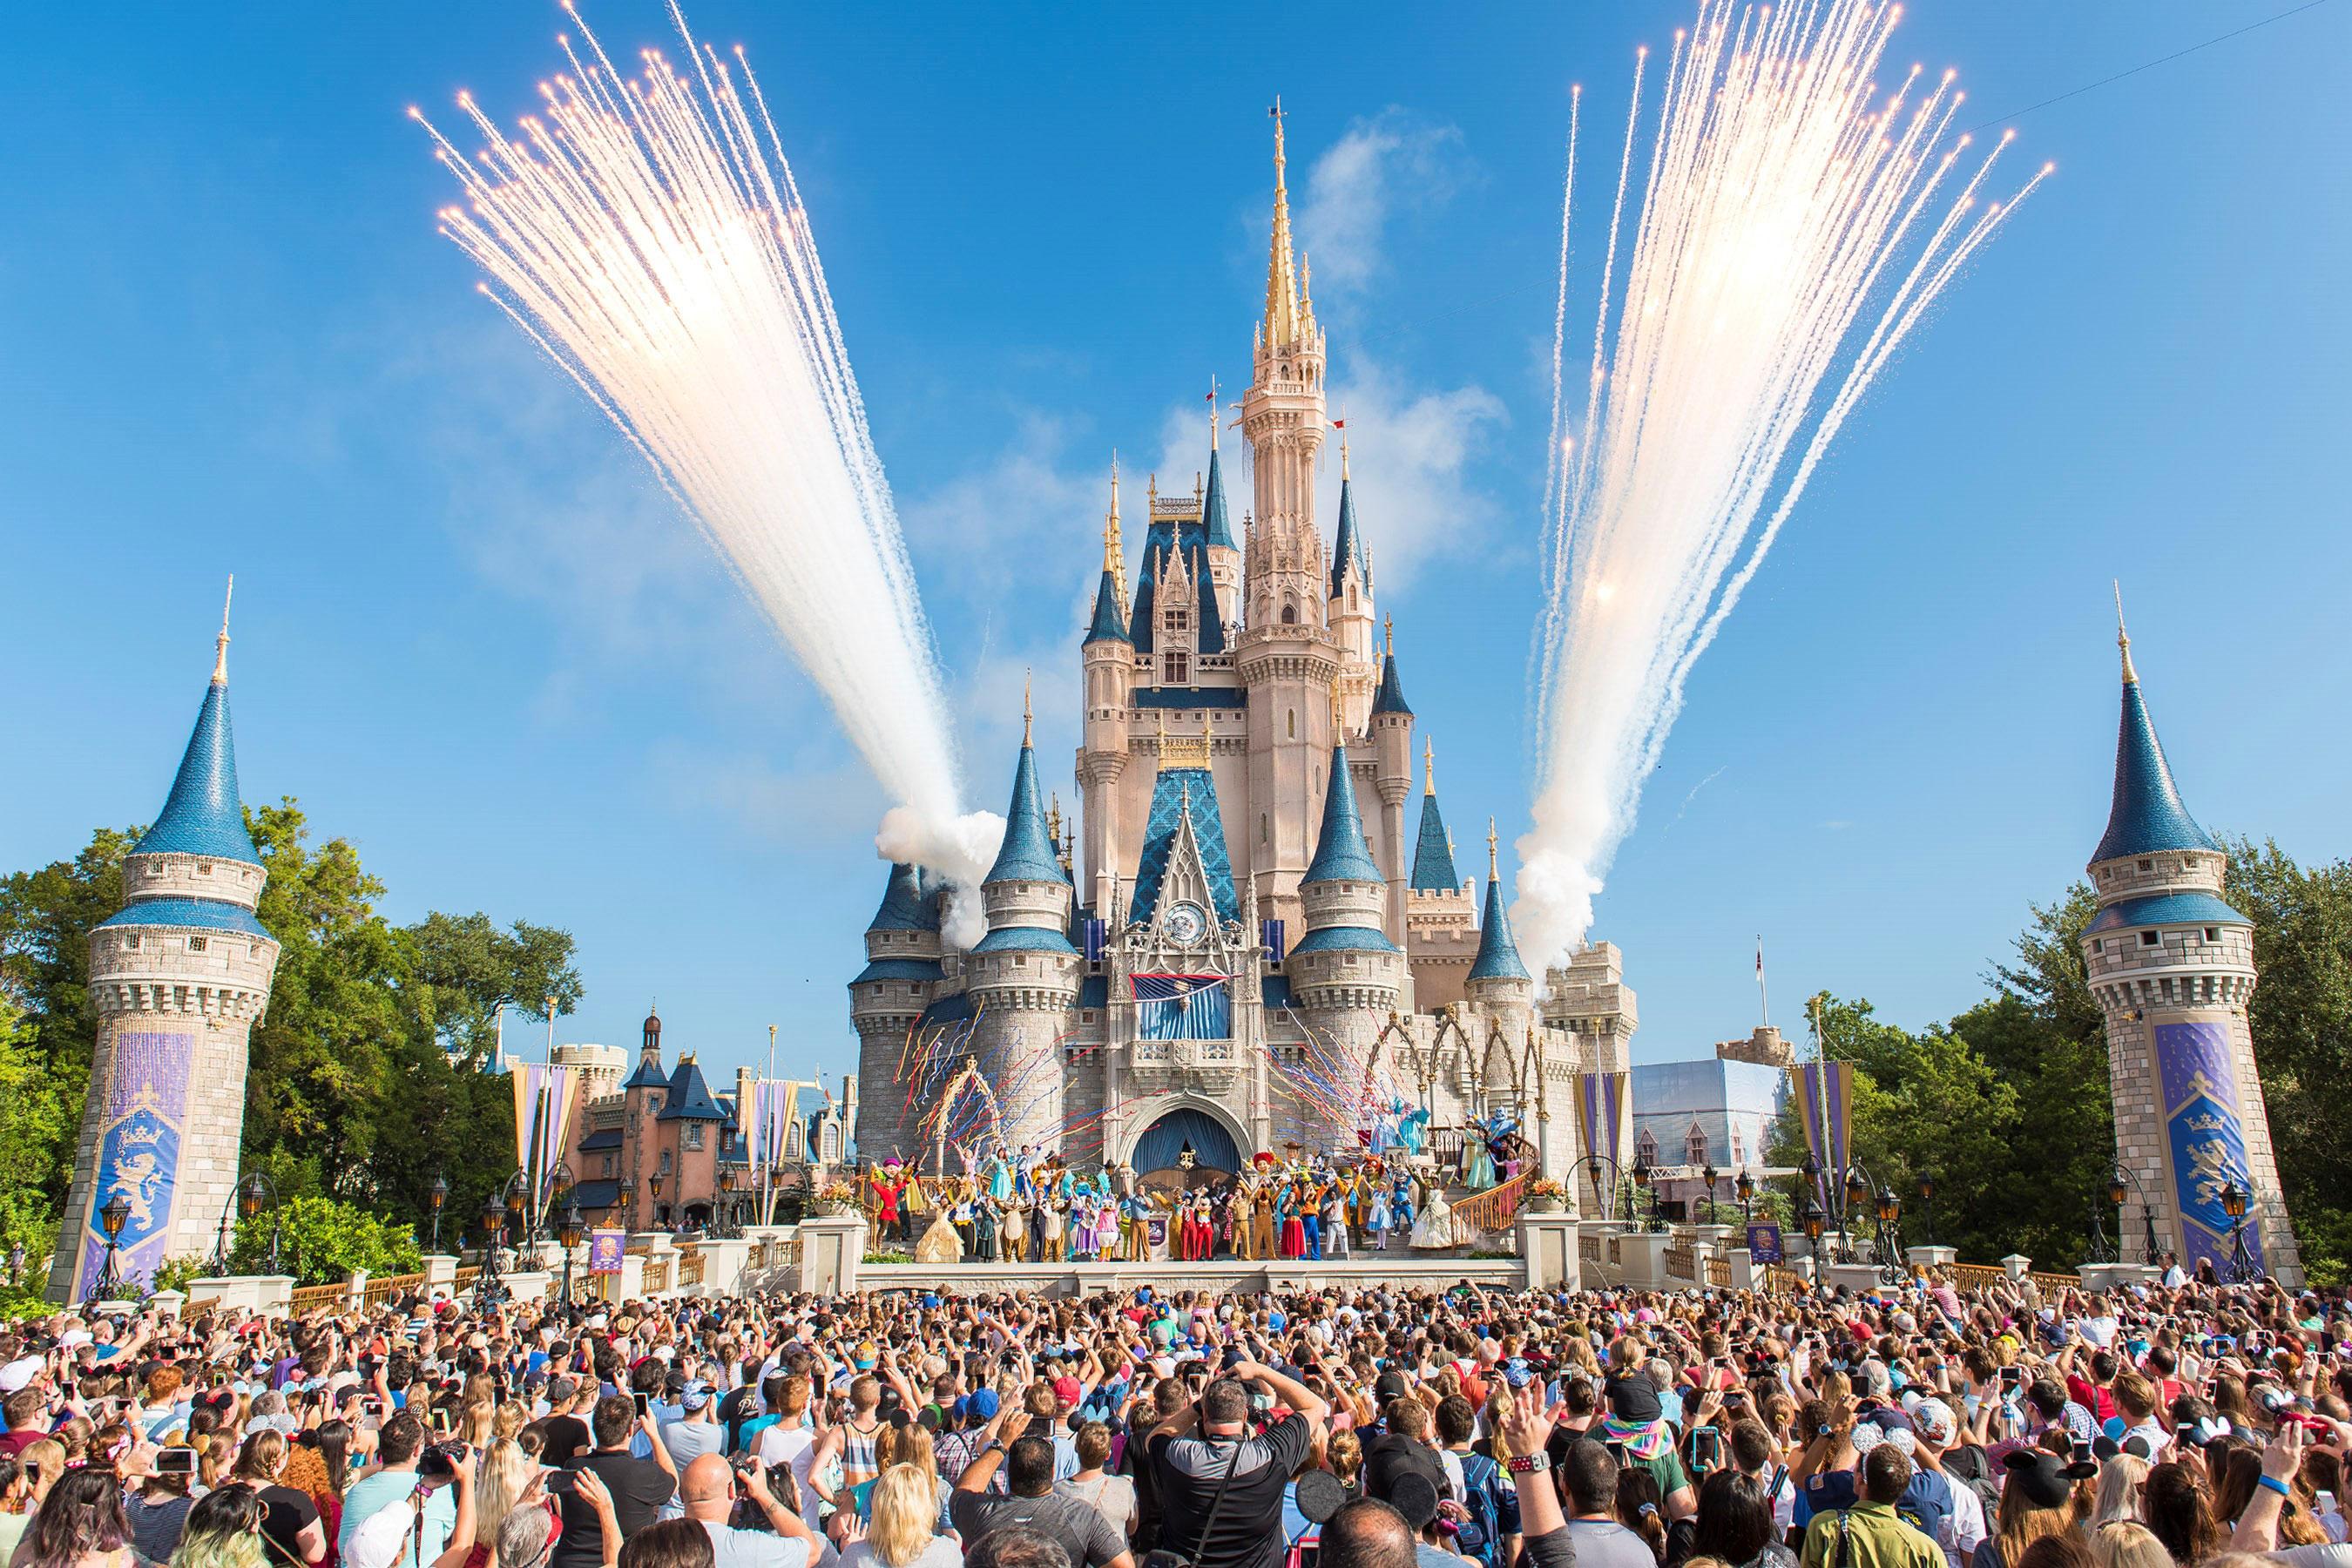 Jacqueline Nell/Disneyland Resort via Getty Images